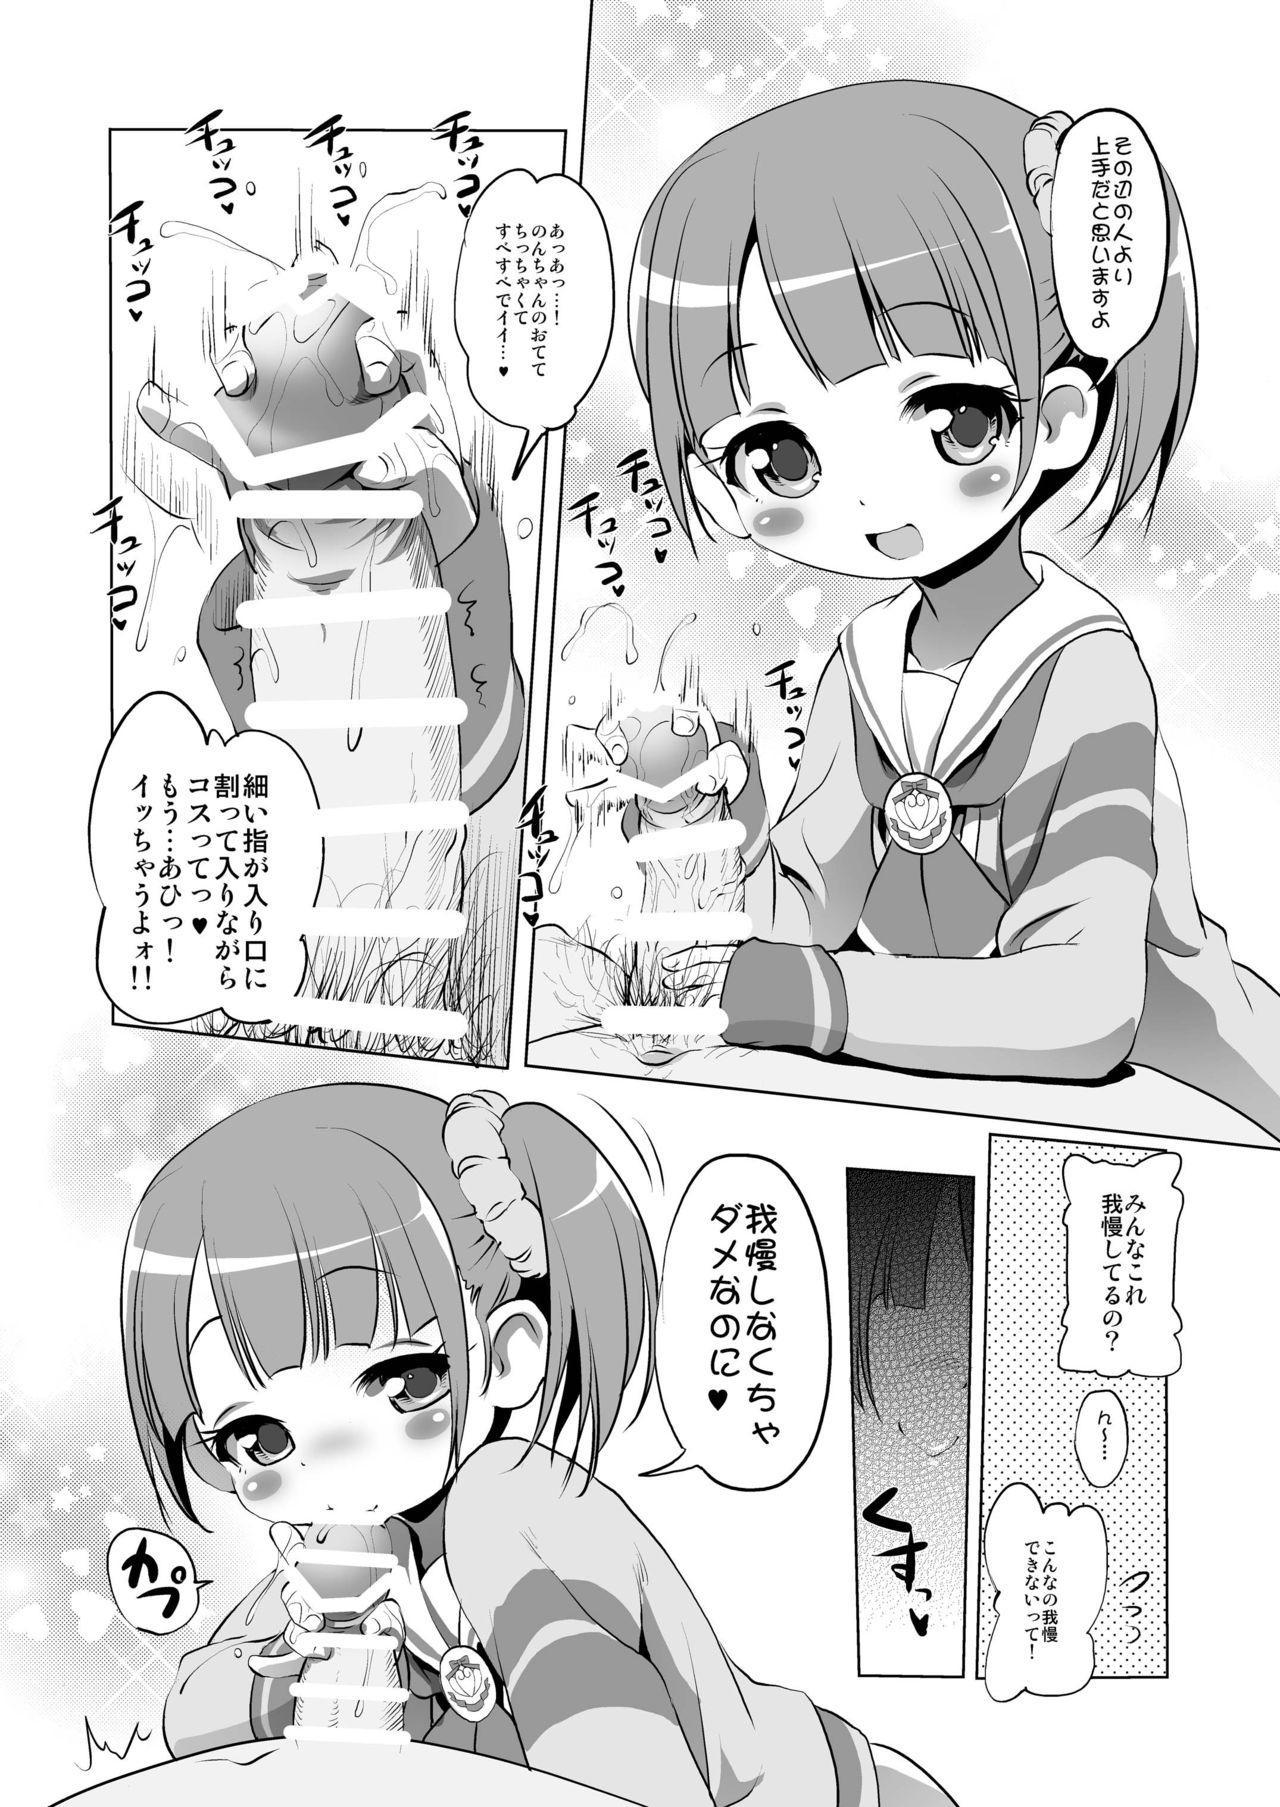 Yukichikepako tte Kashikoma! 3